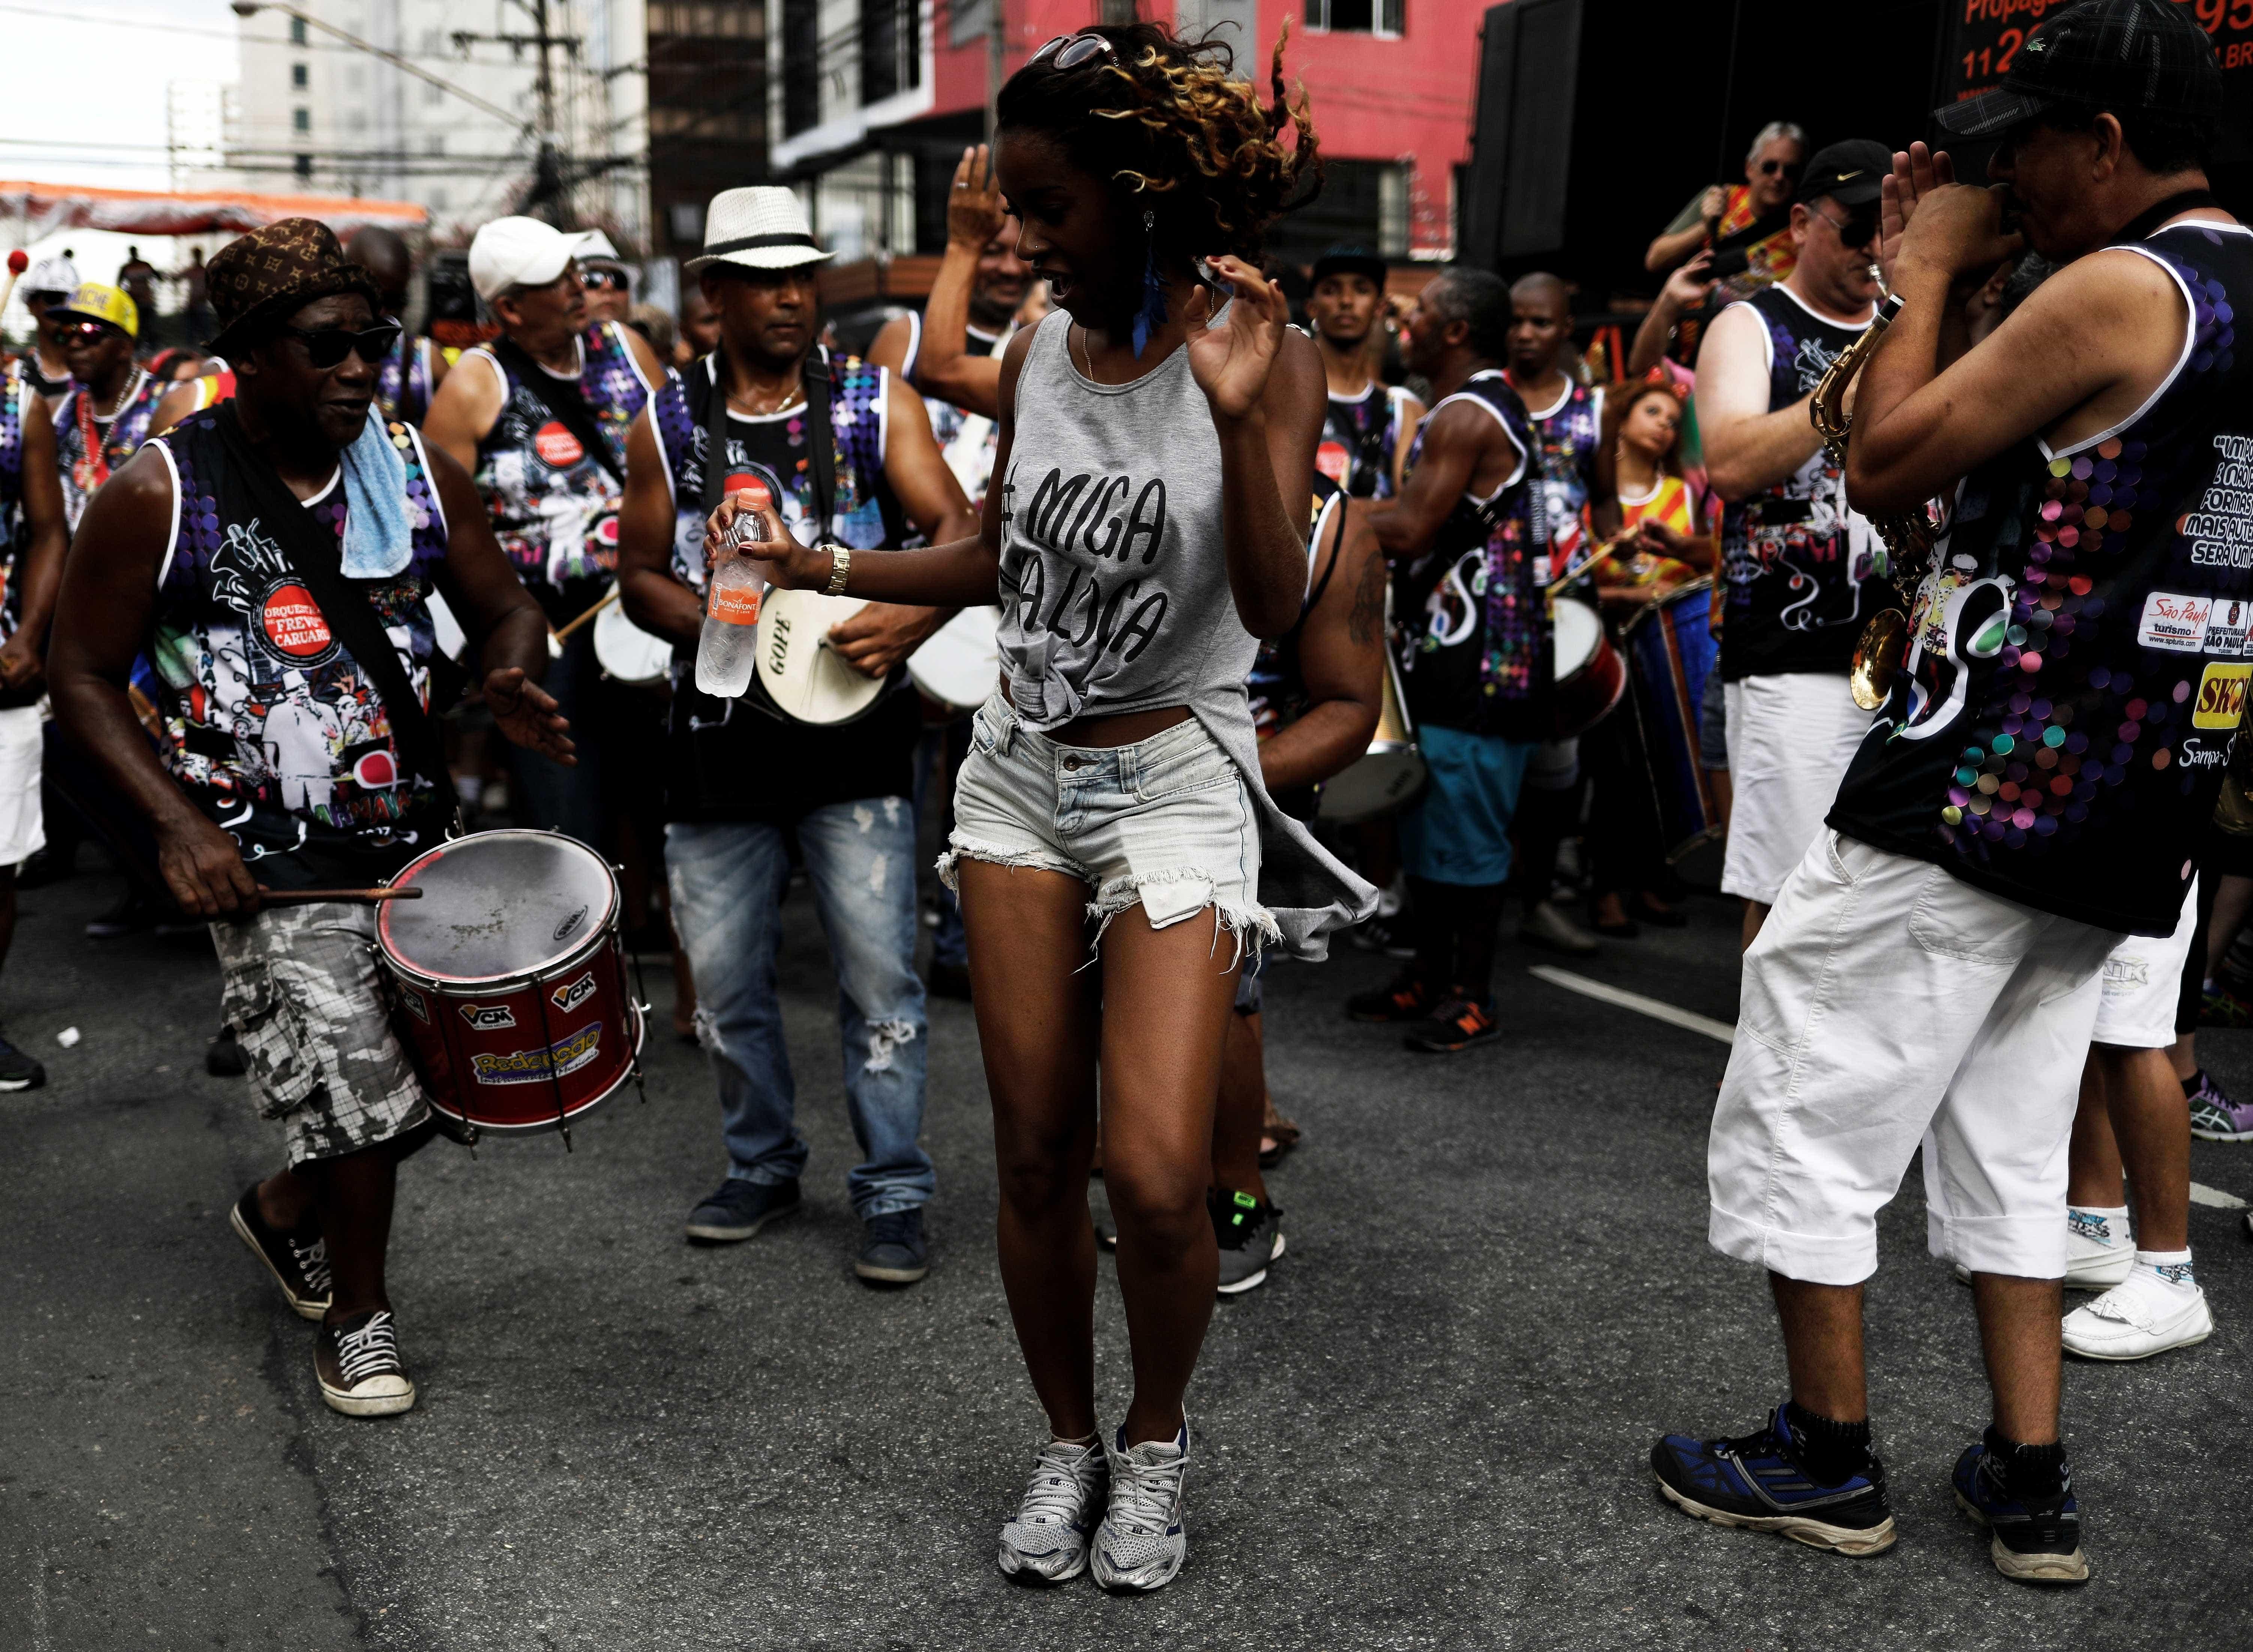 Carnaval de SP tem impasse sobre megablocos